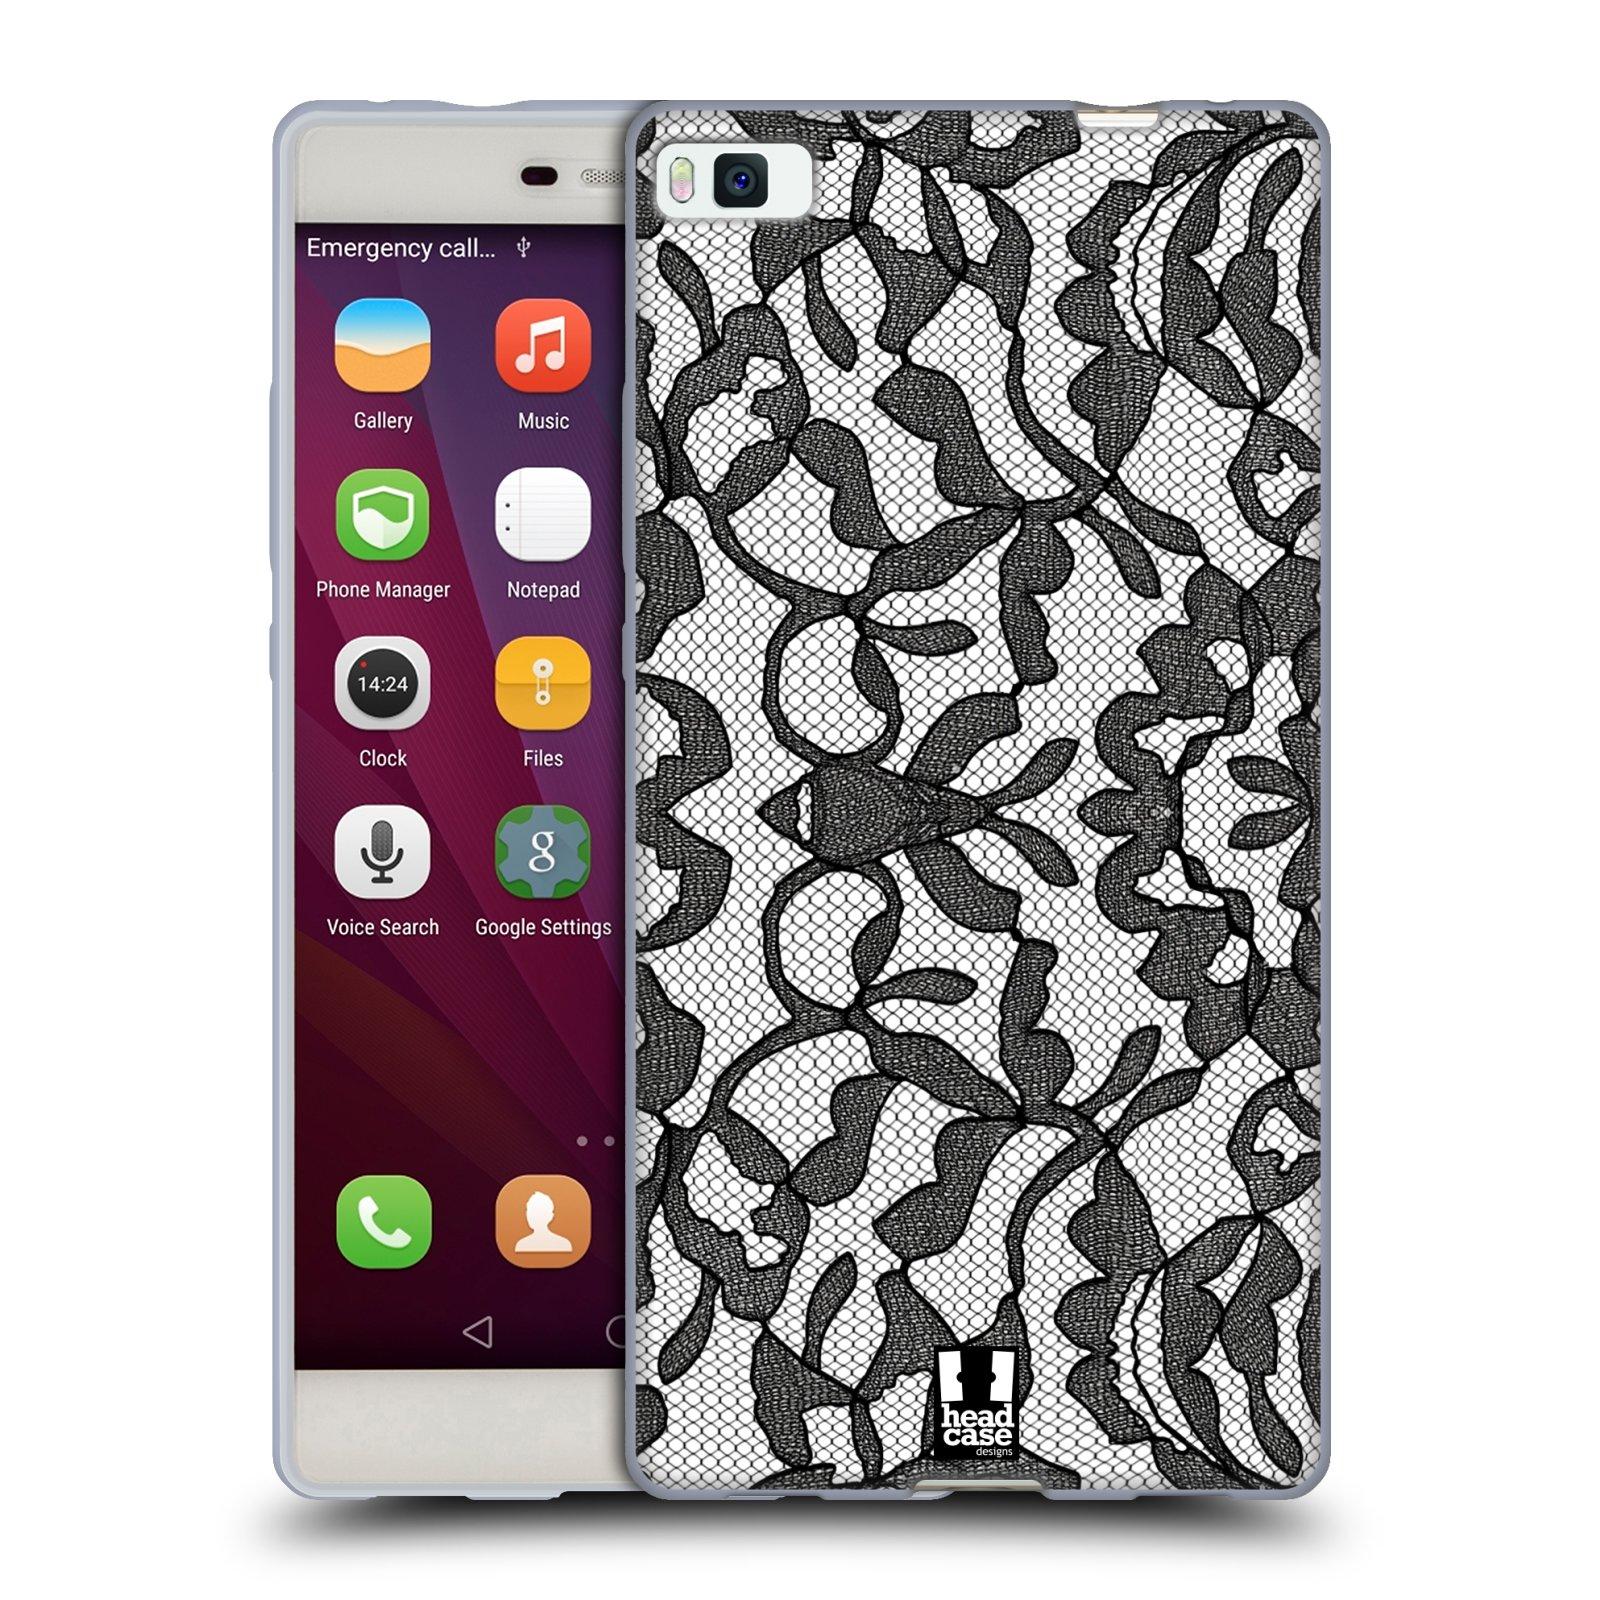 Silikonové pouzdro na mobil Huawei P8 HEAD CASE LEAFY KRAJKA (Silikonový kryt či obal na mobilní telefon Huawei Ascend P8)